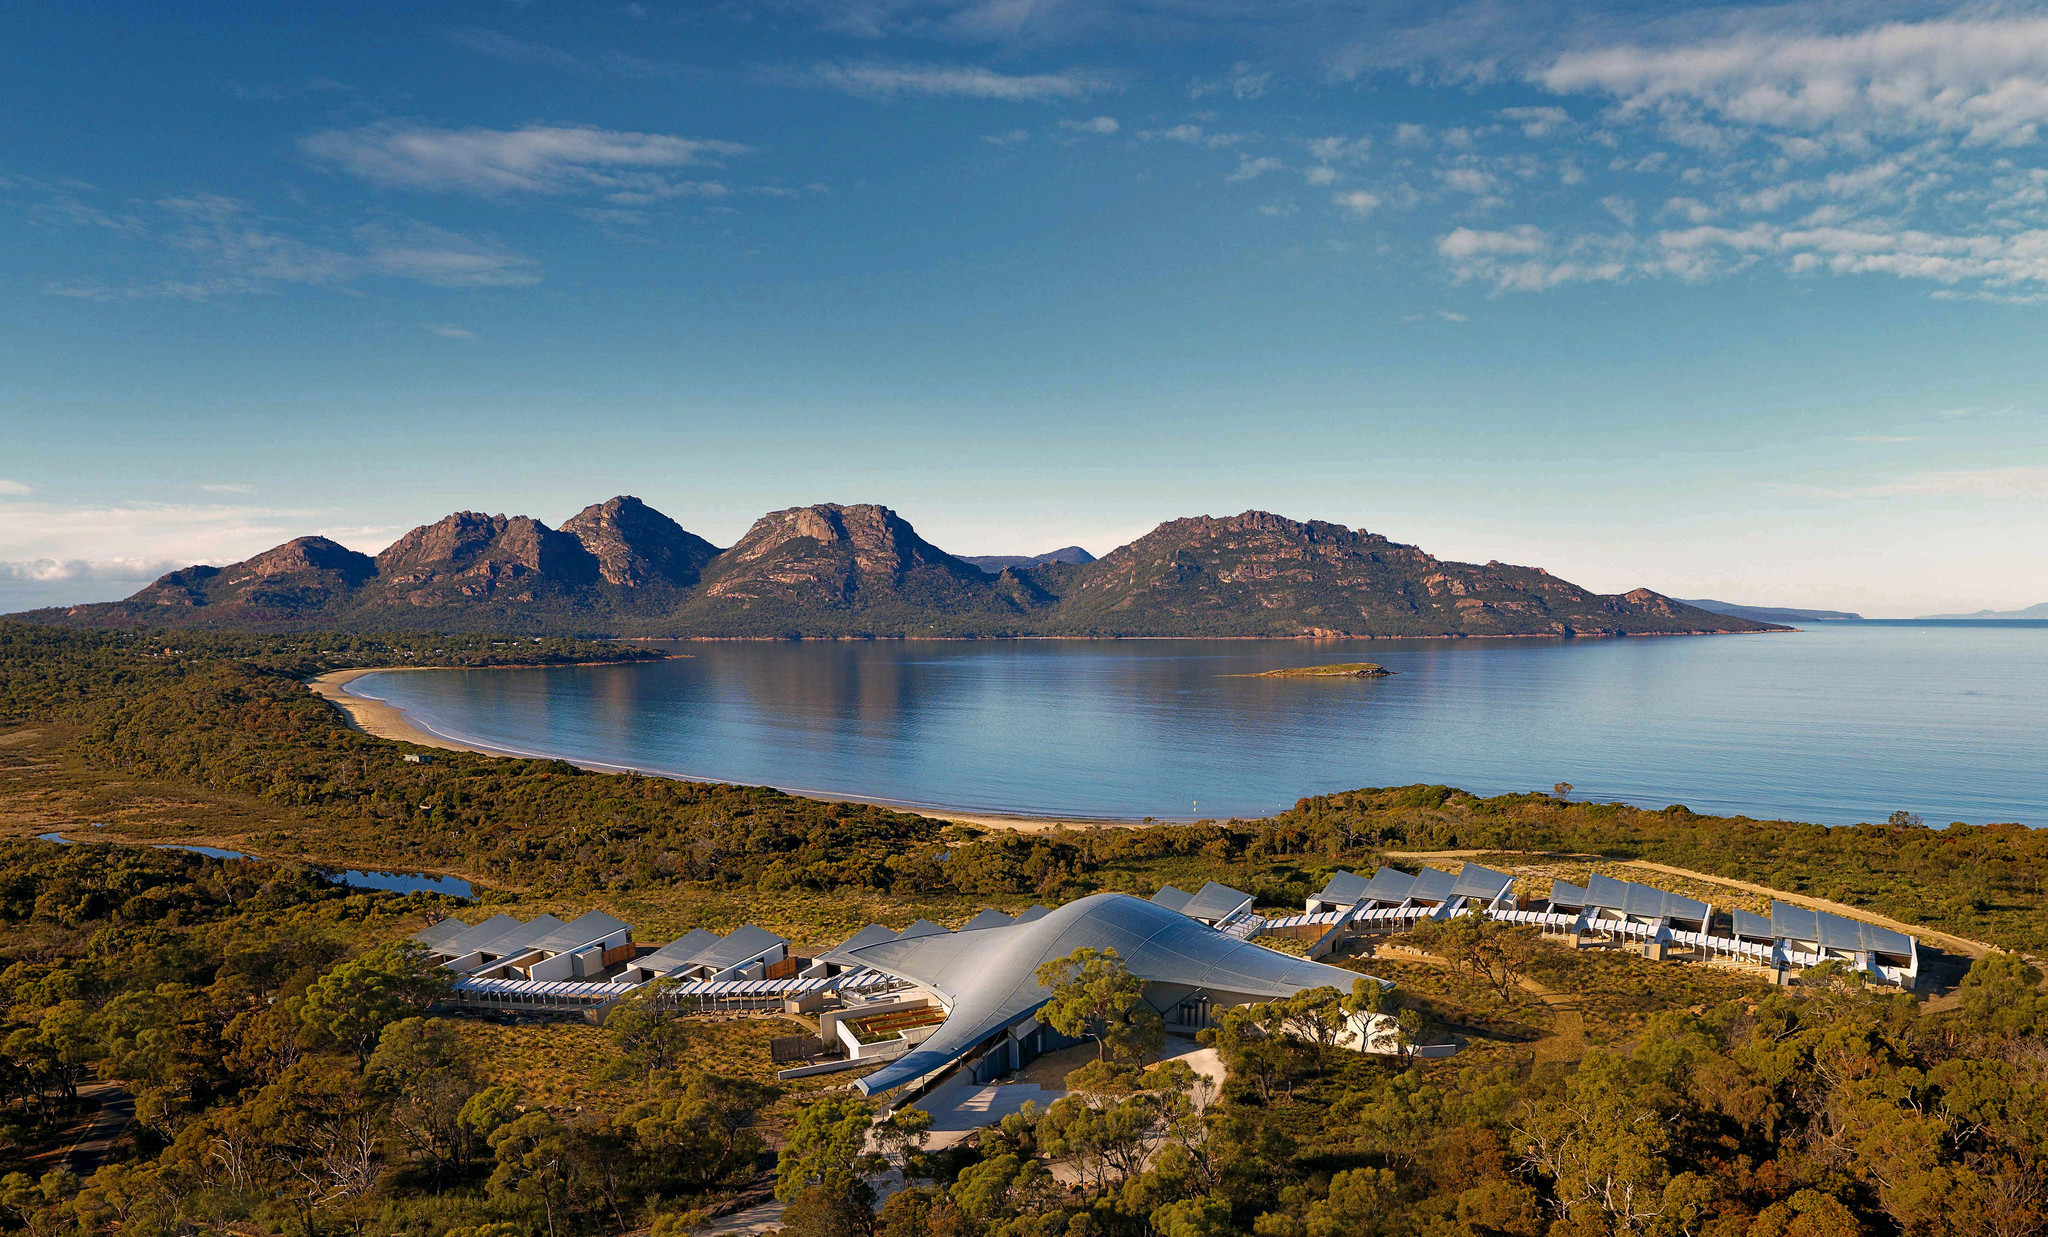 Australia's Tasmania, Kangaroo Island offer pure, strange delights - LA Times